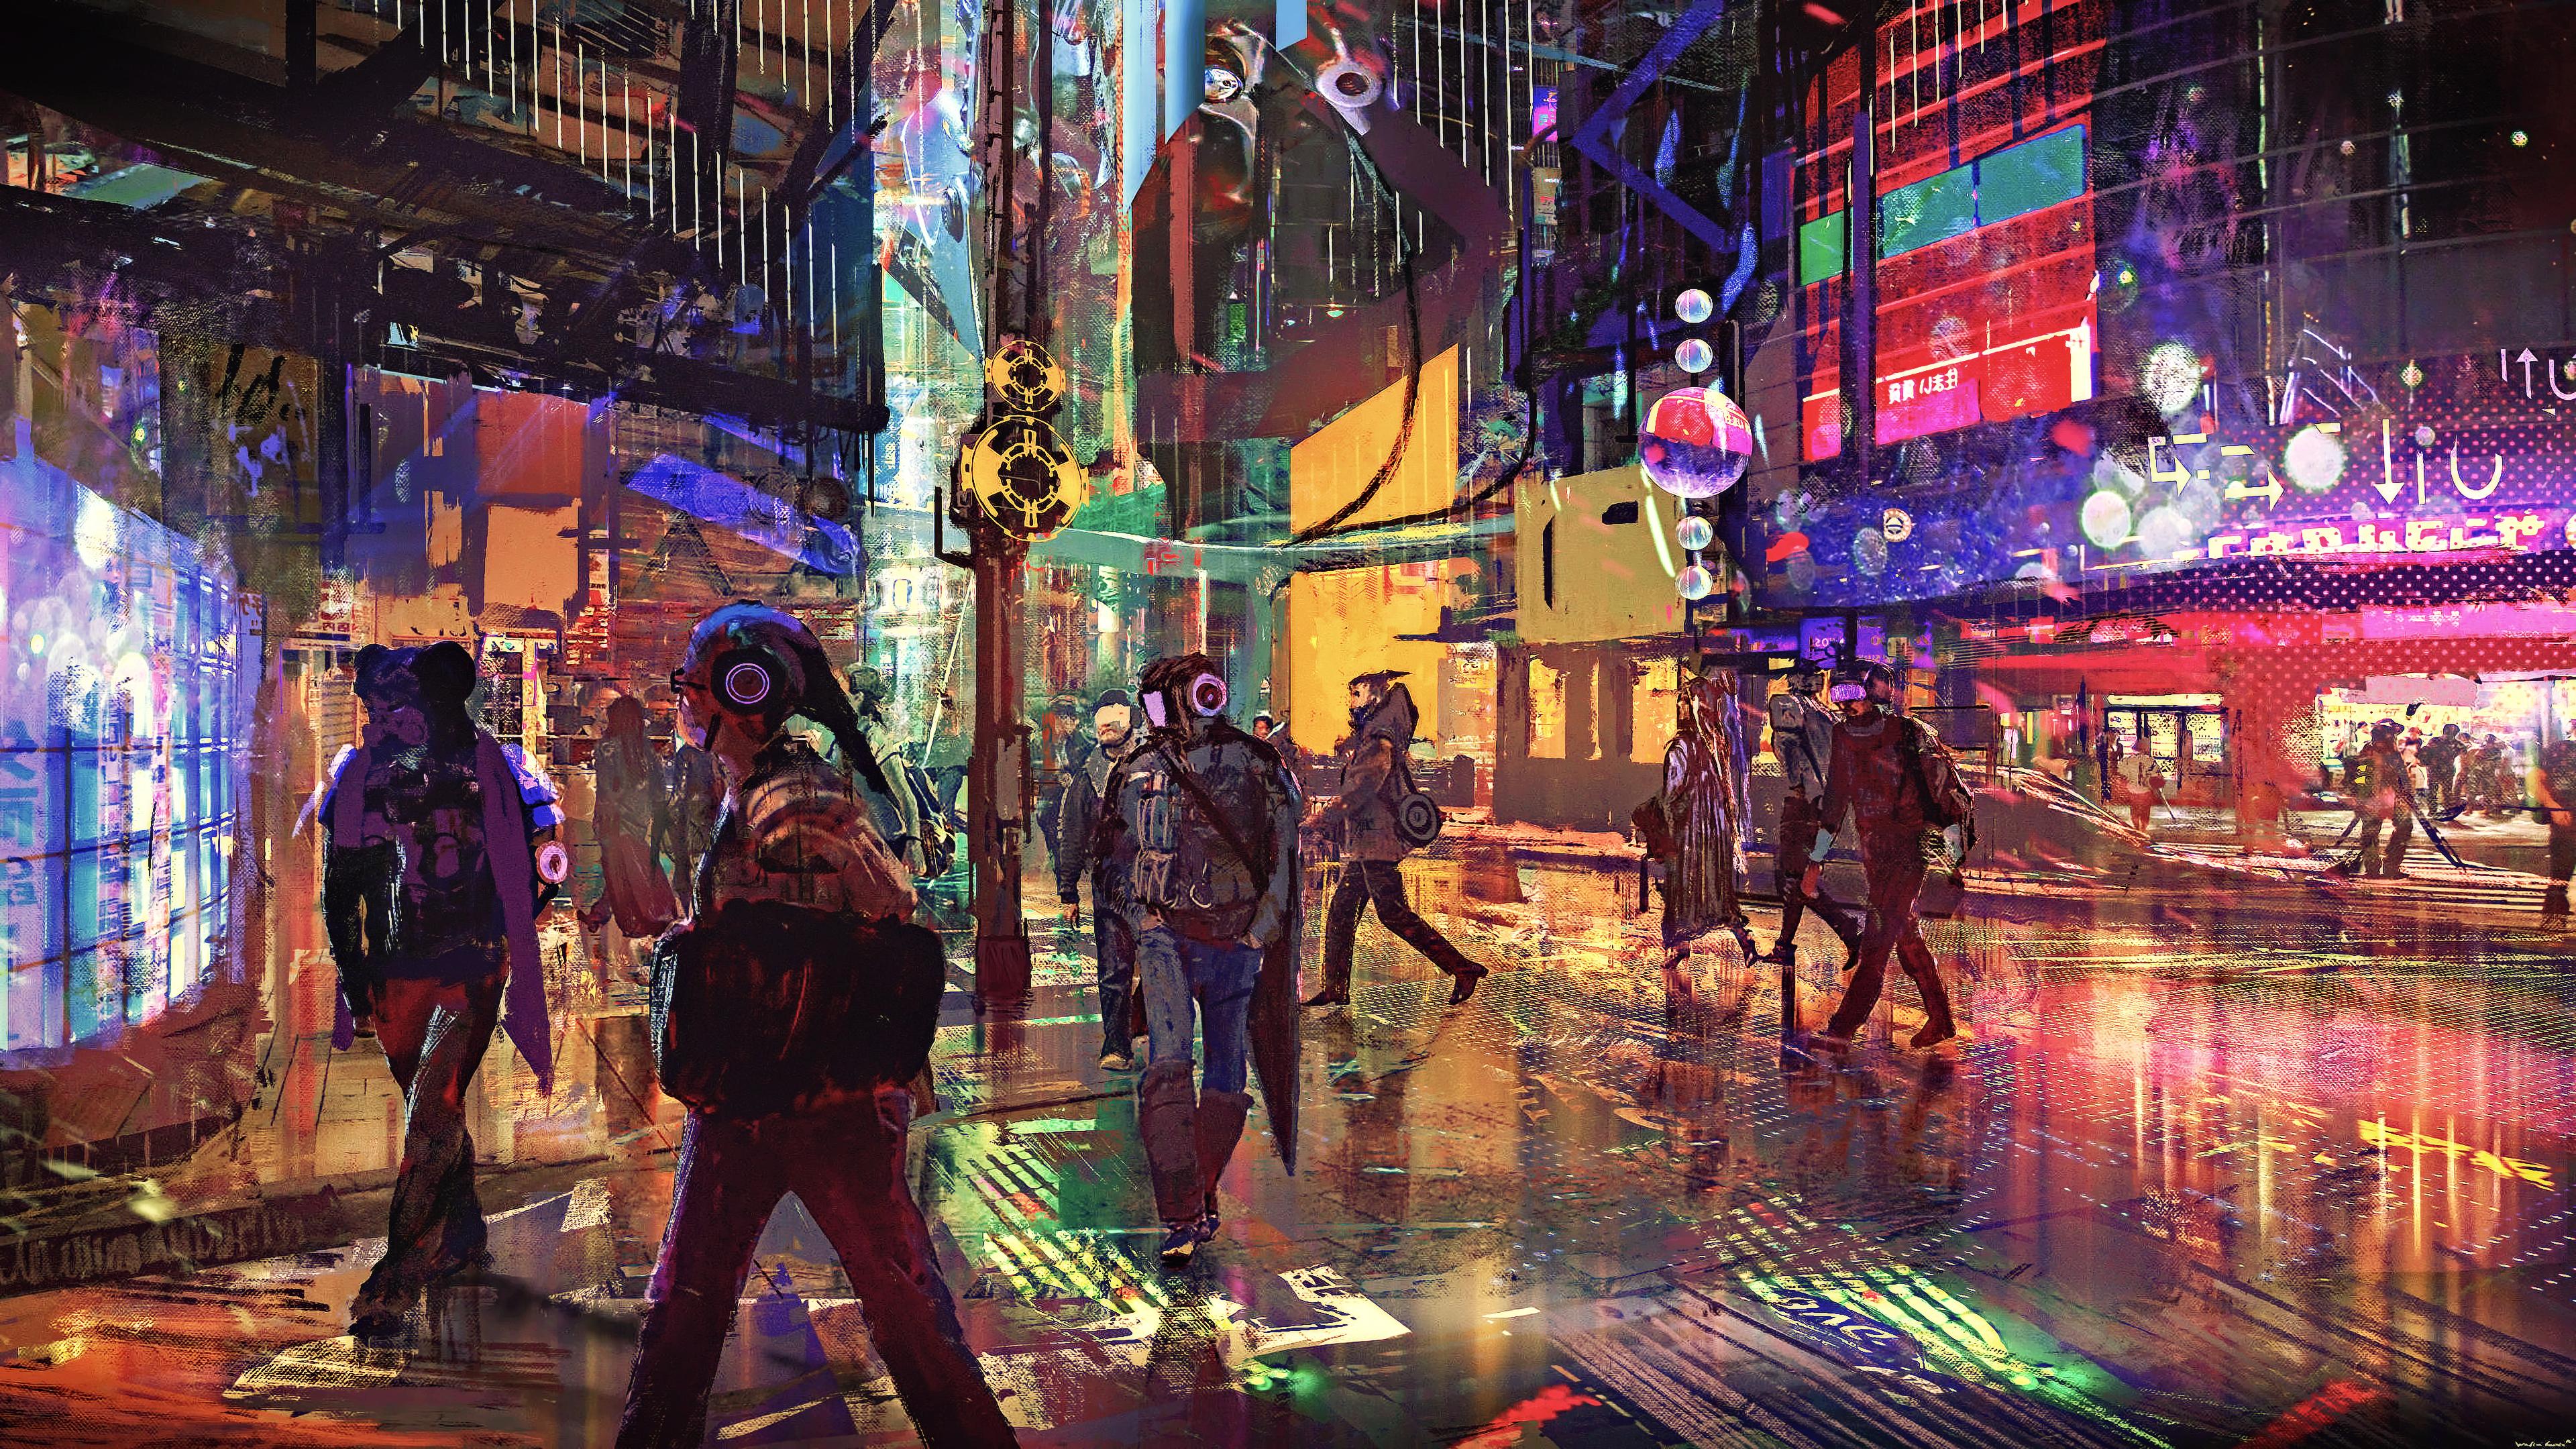 General 3840x2160 cyber science fiction digital art concept art cyberpunk artwork futuristic fantasy art fan art cityscape futuristic city CGI technology